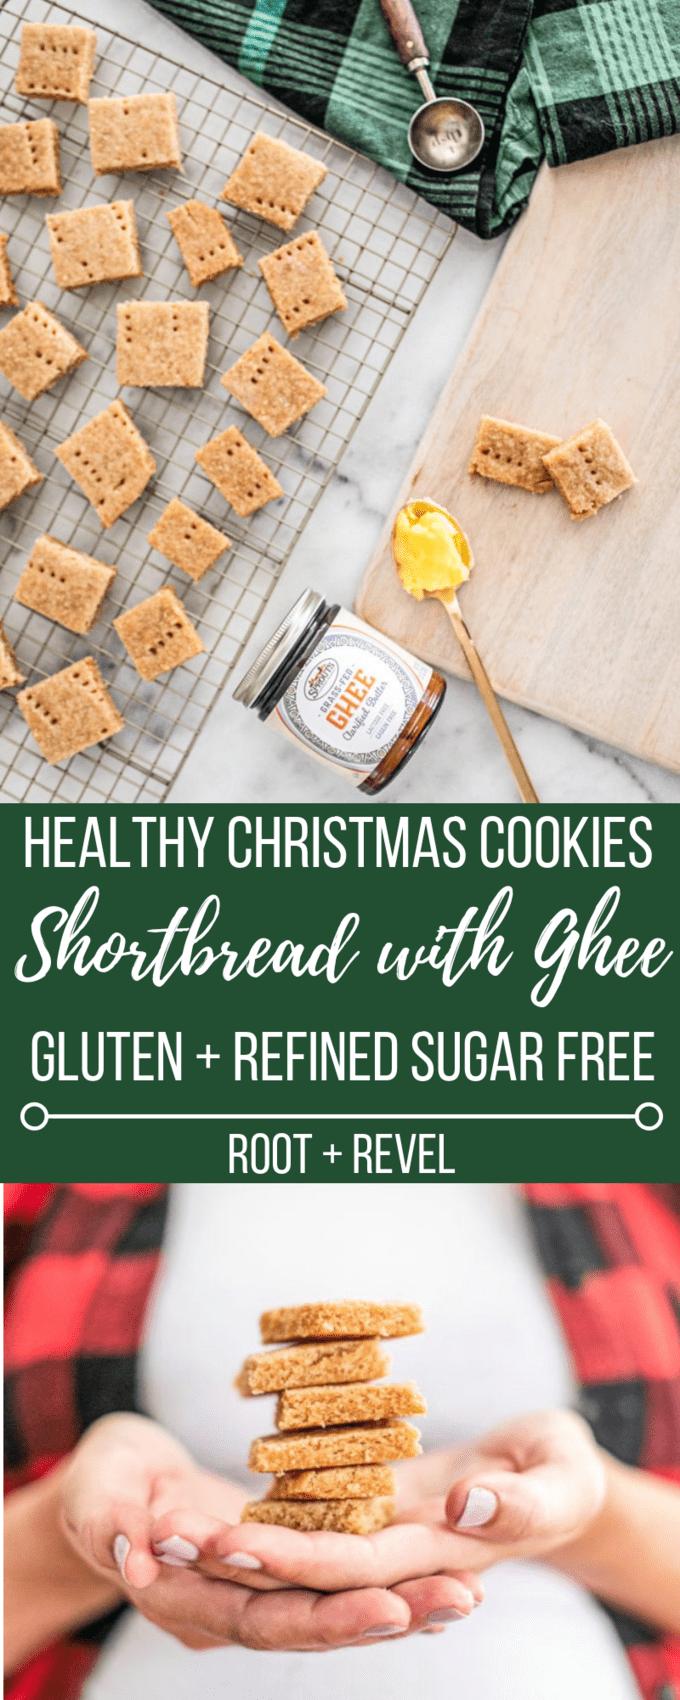 Healthy Christmas Cookies Shortbread Recipe With Ghee Gluten Free Refined Sugar Free